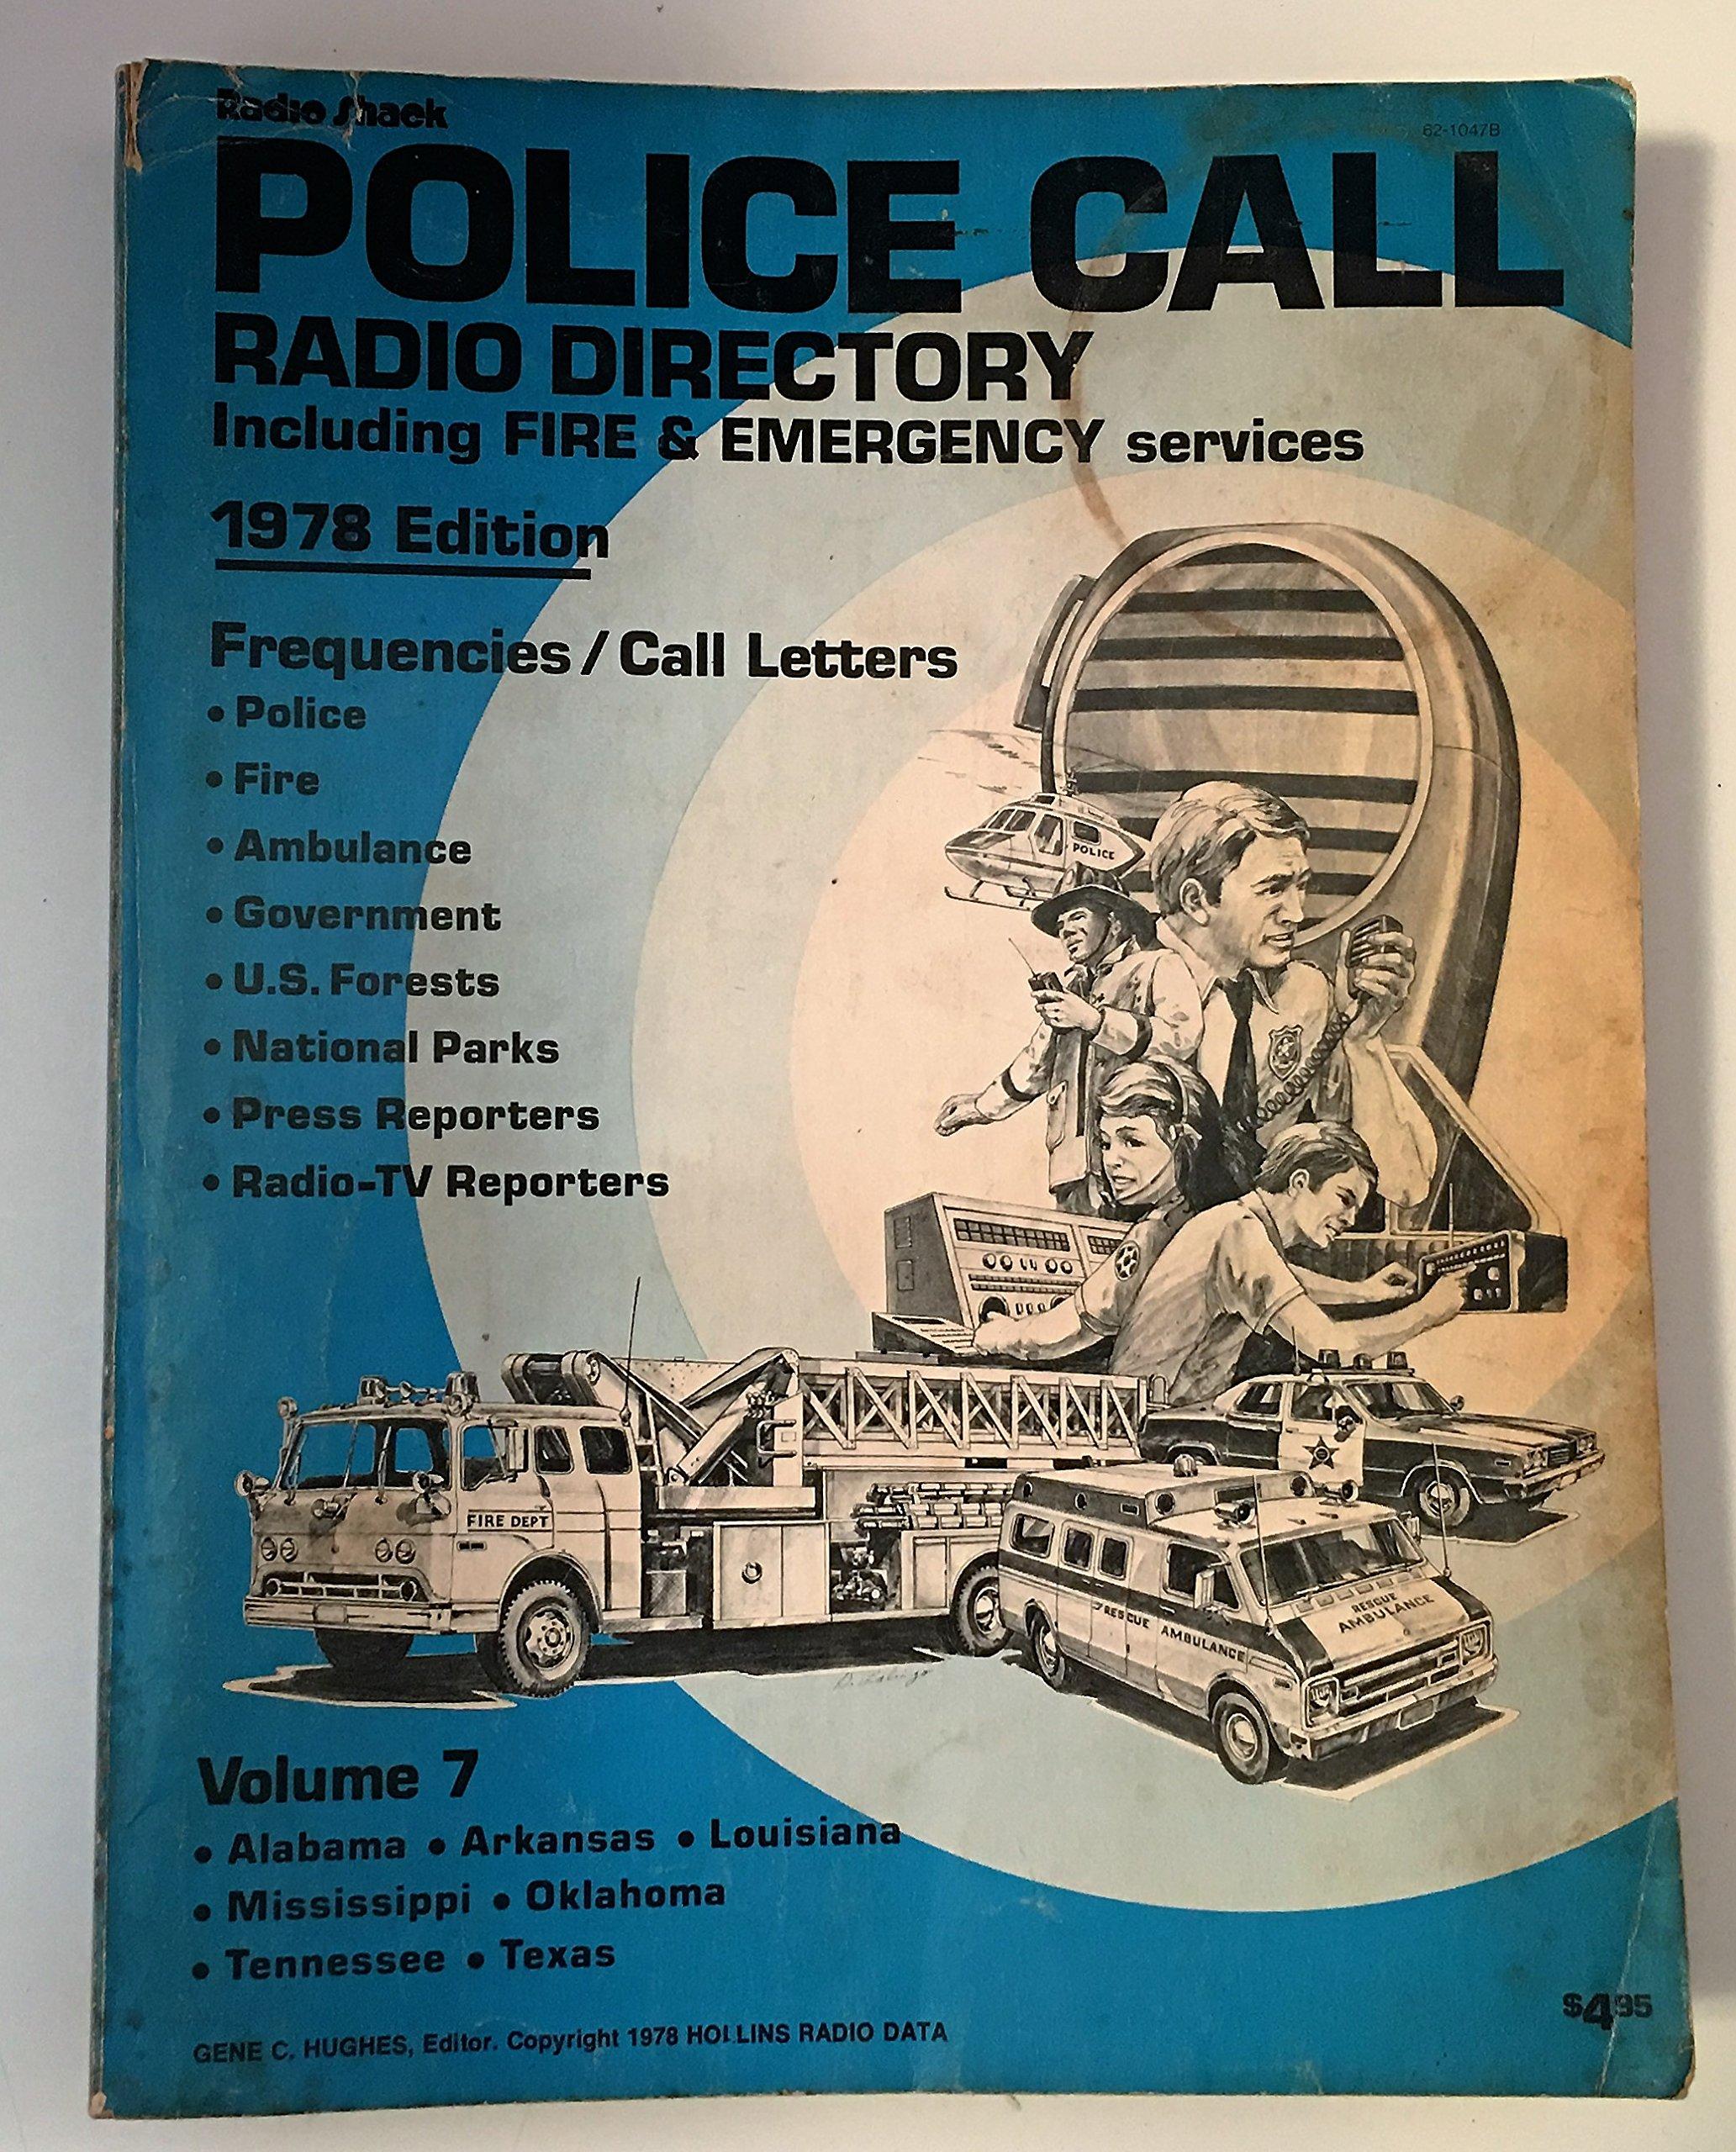 Radio Shack: Police Call Radio Directory Including Fire